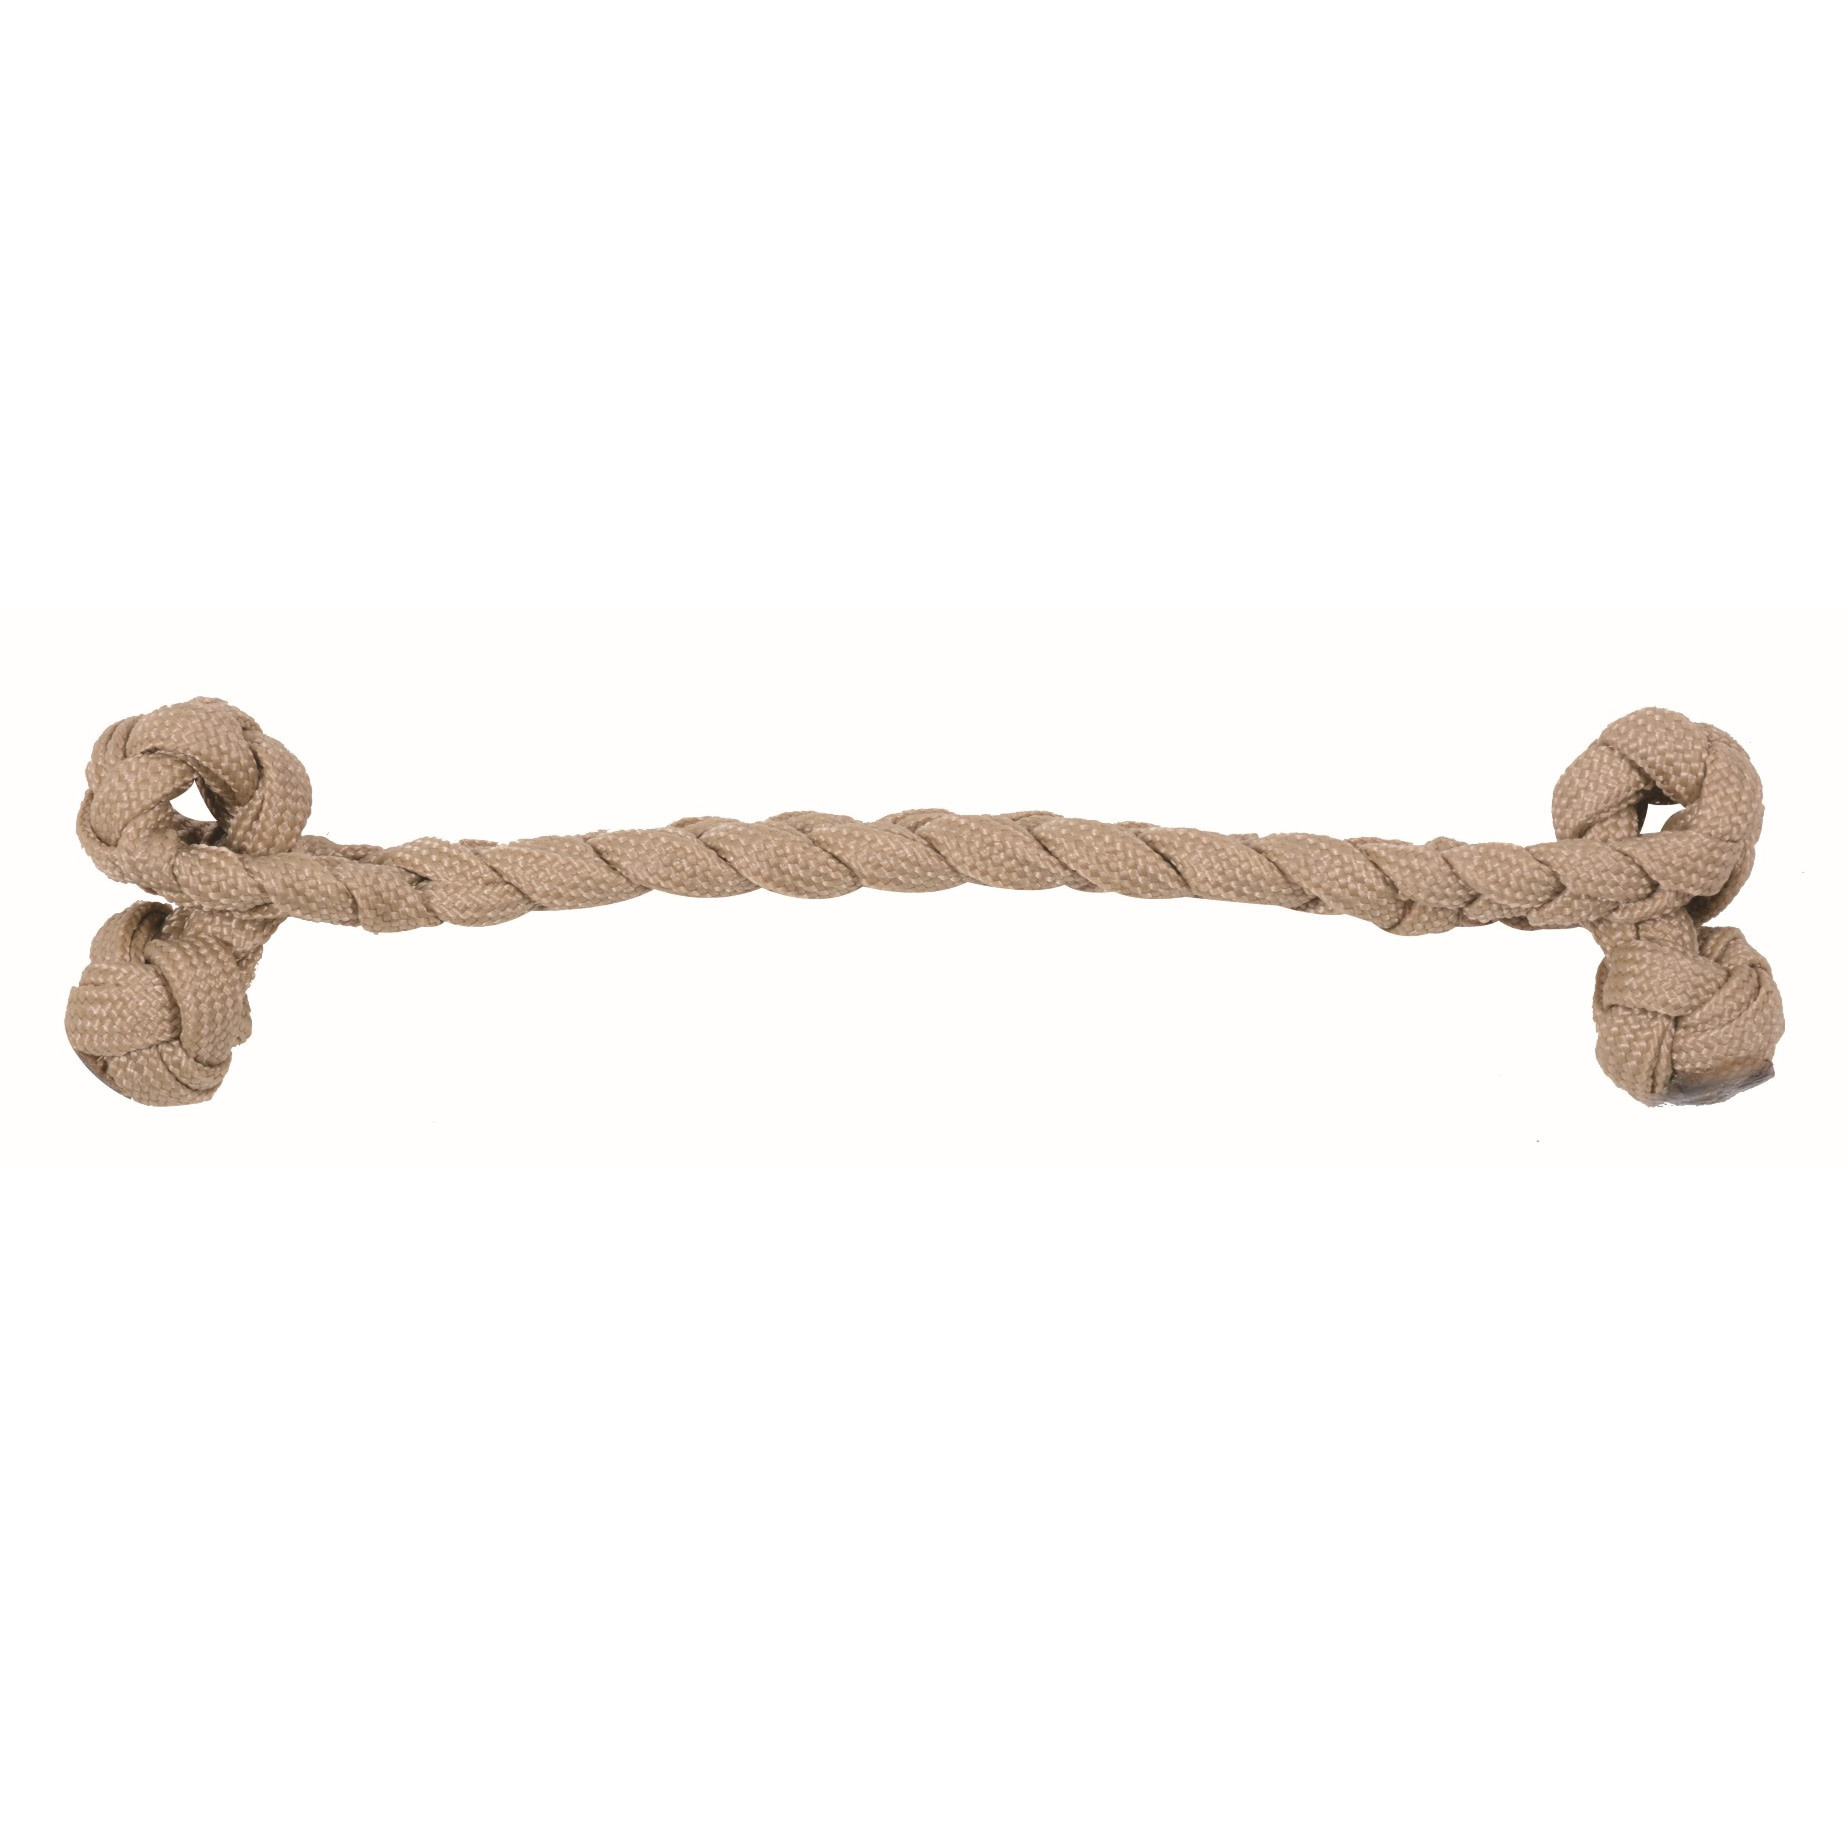 Western Rawhide Braided nylon slobber strap